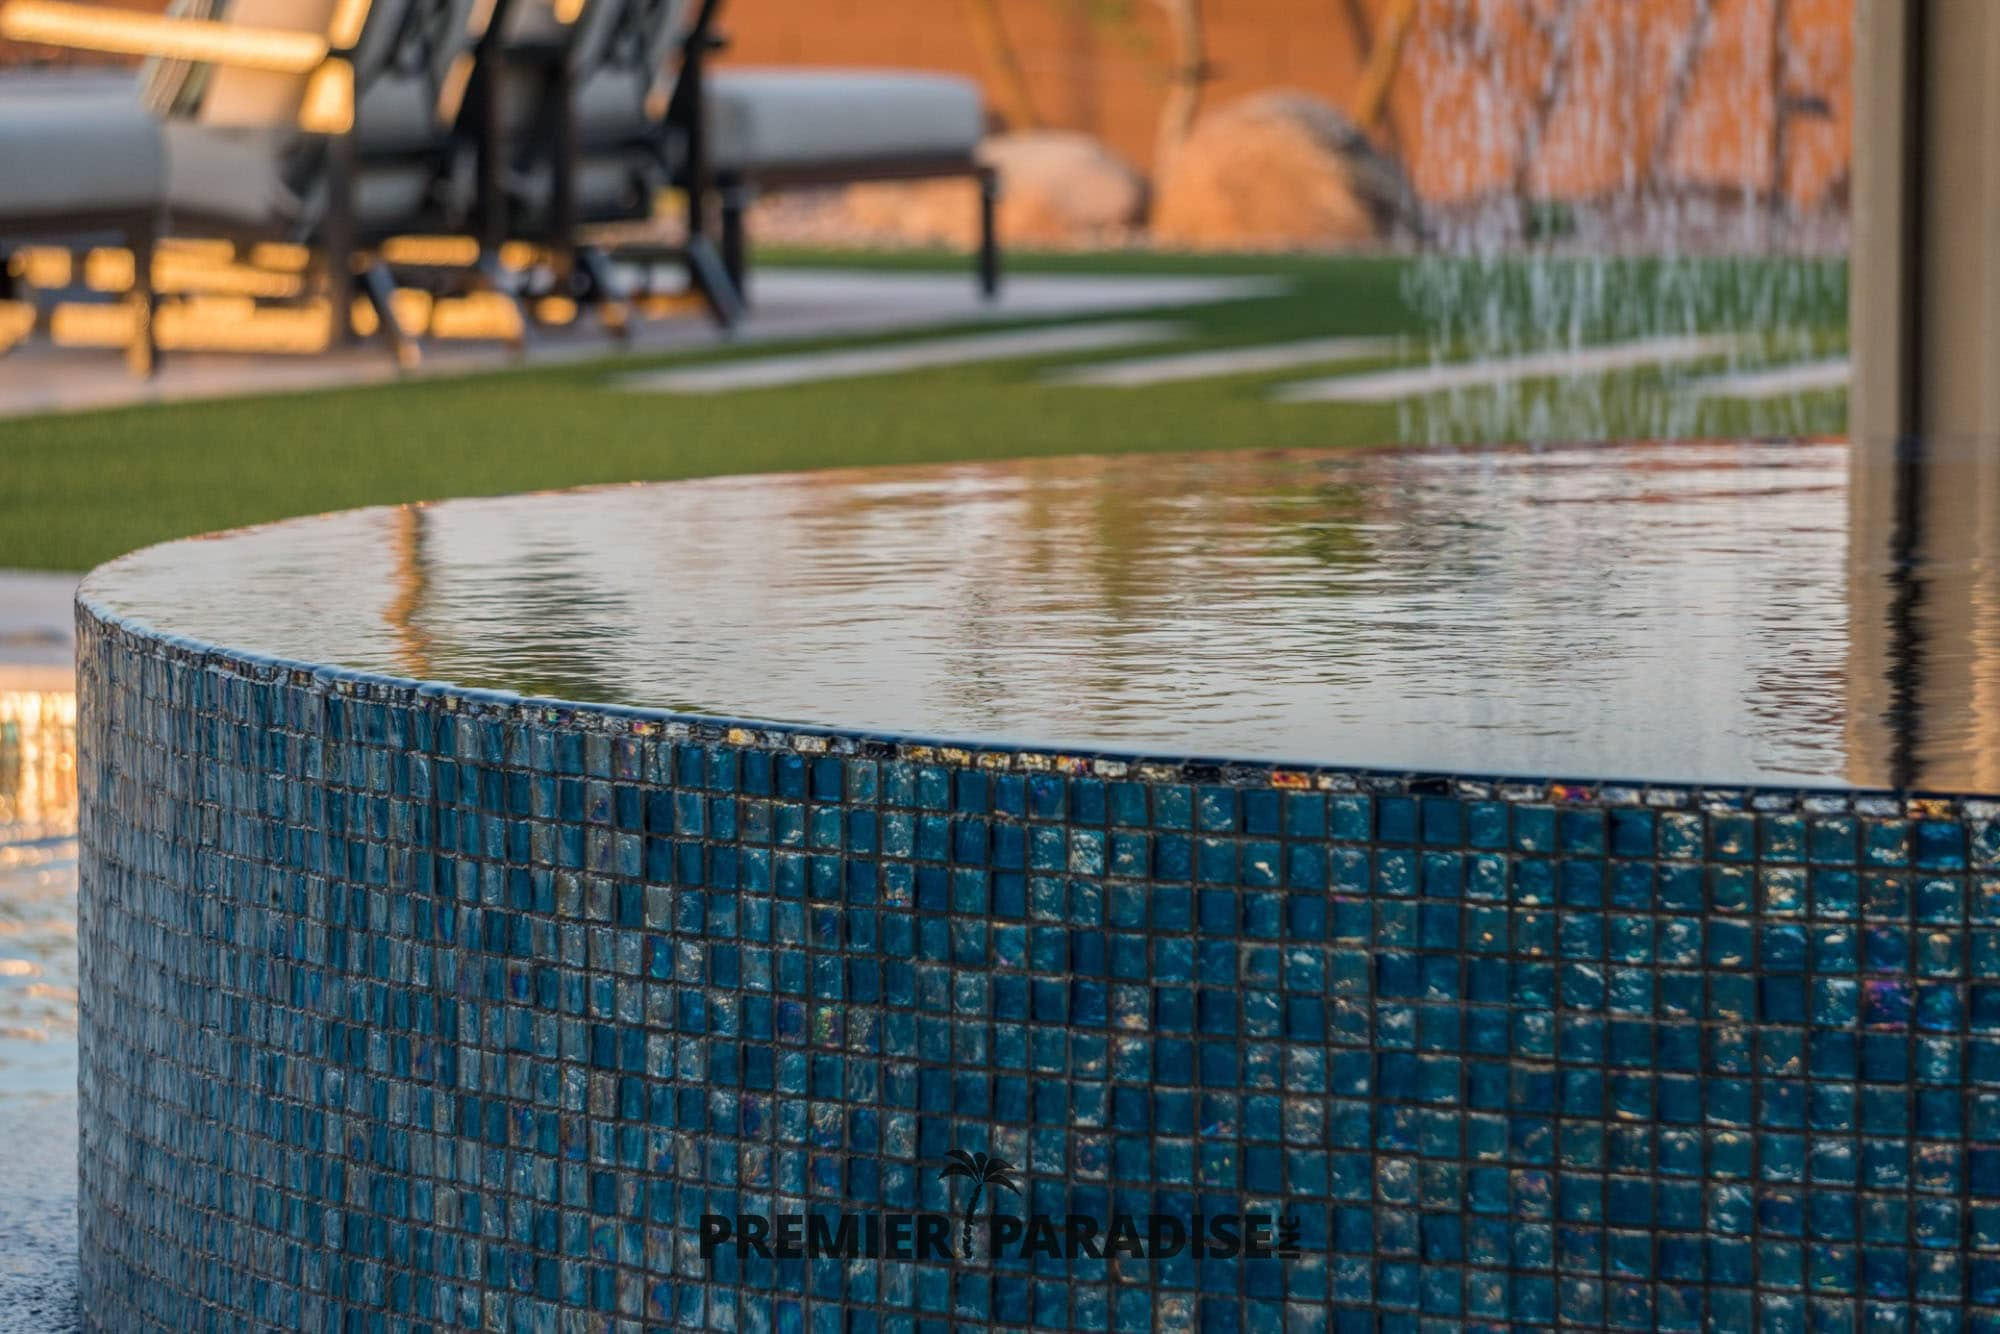 pool builder phoenix custom glass tile spa hot tub design gallery premier paradise inc 5 premier paradise inc